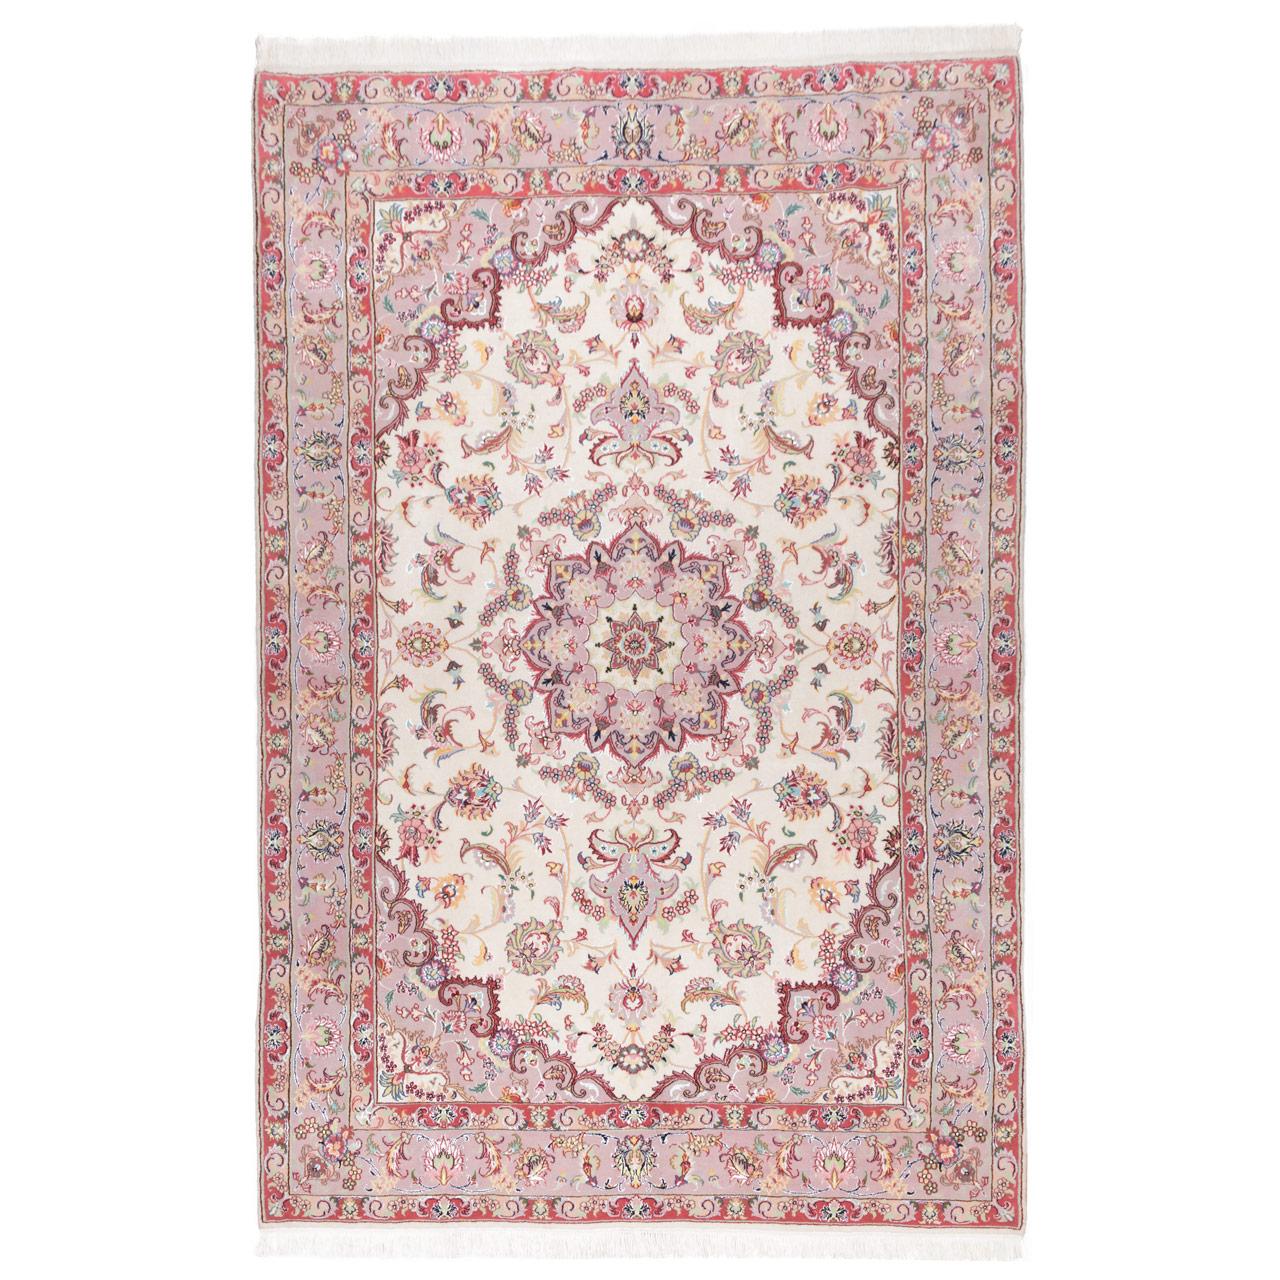 فرش دستباف شش متری سی پرشیا کد 170017